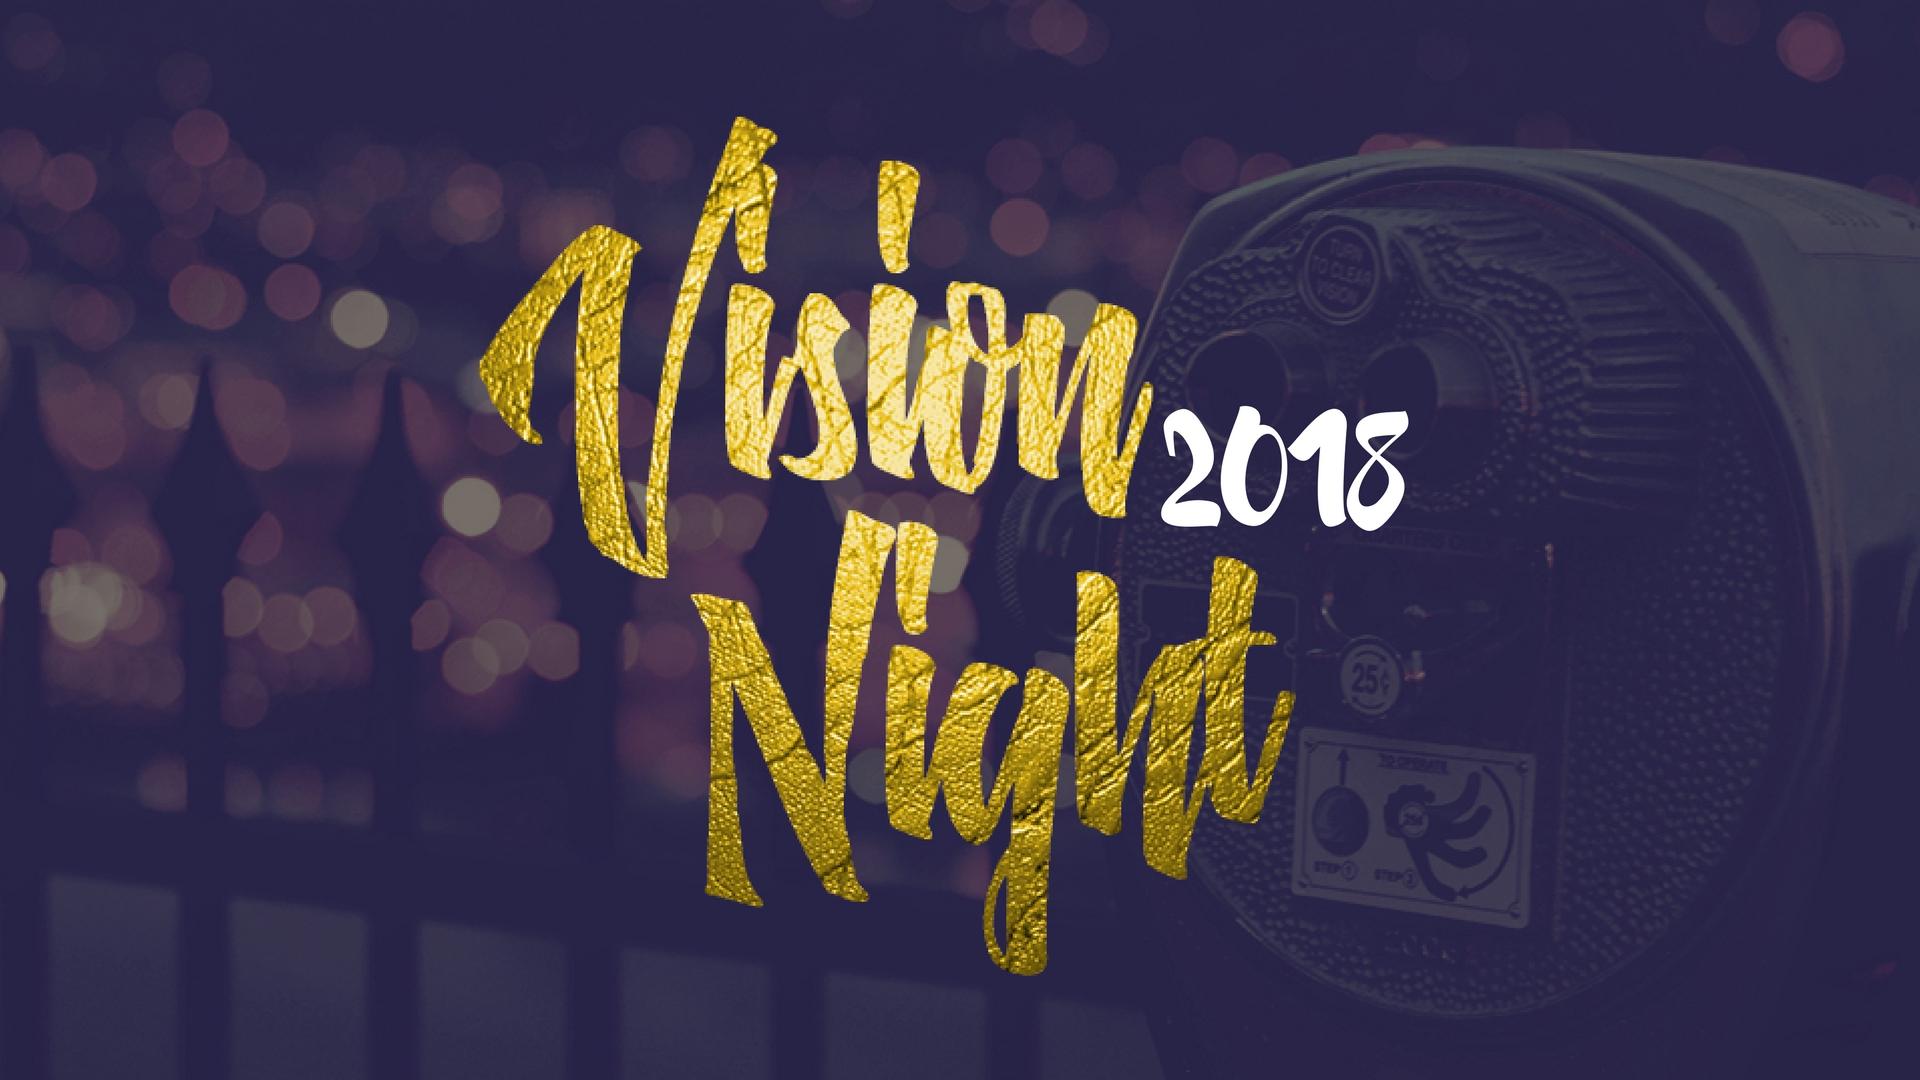 Vision Night - February 2018